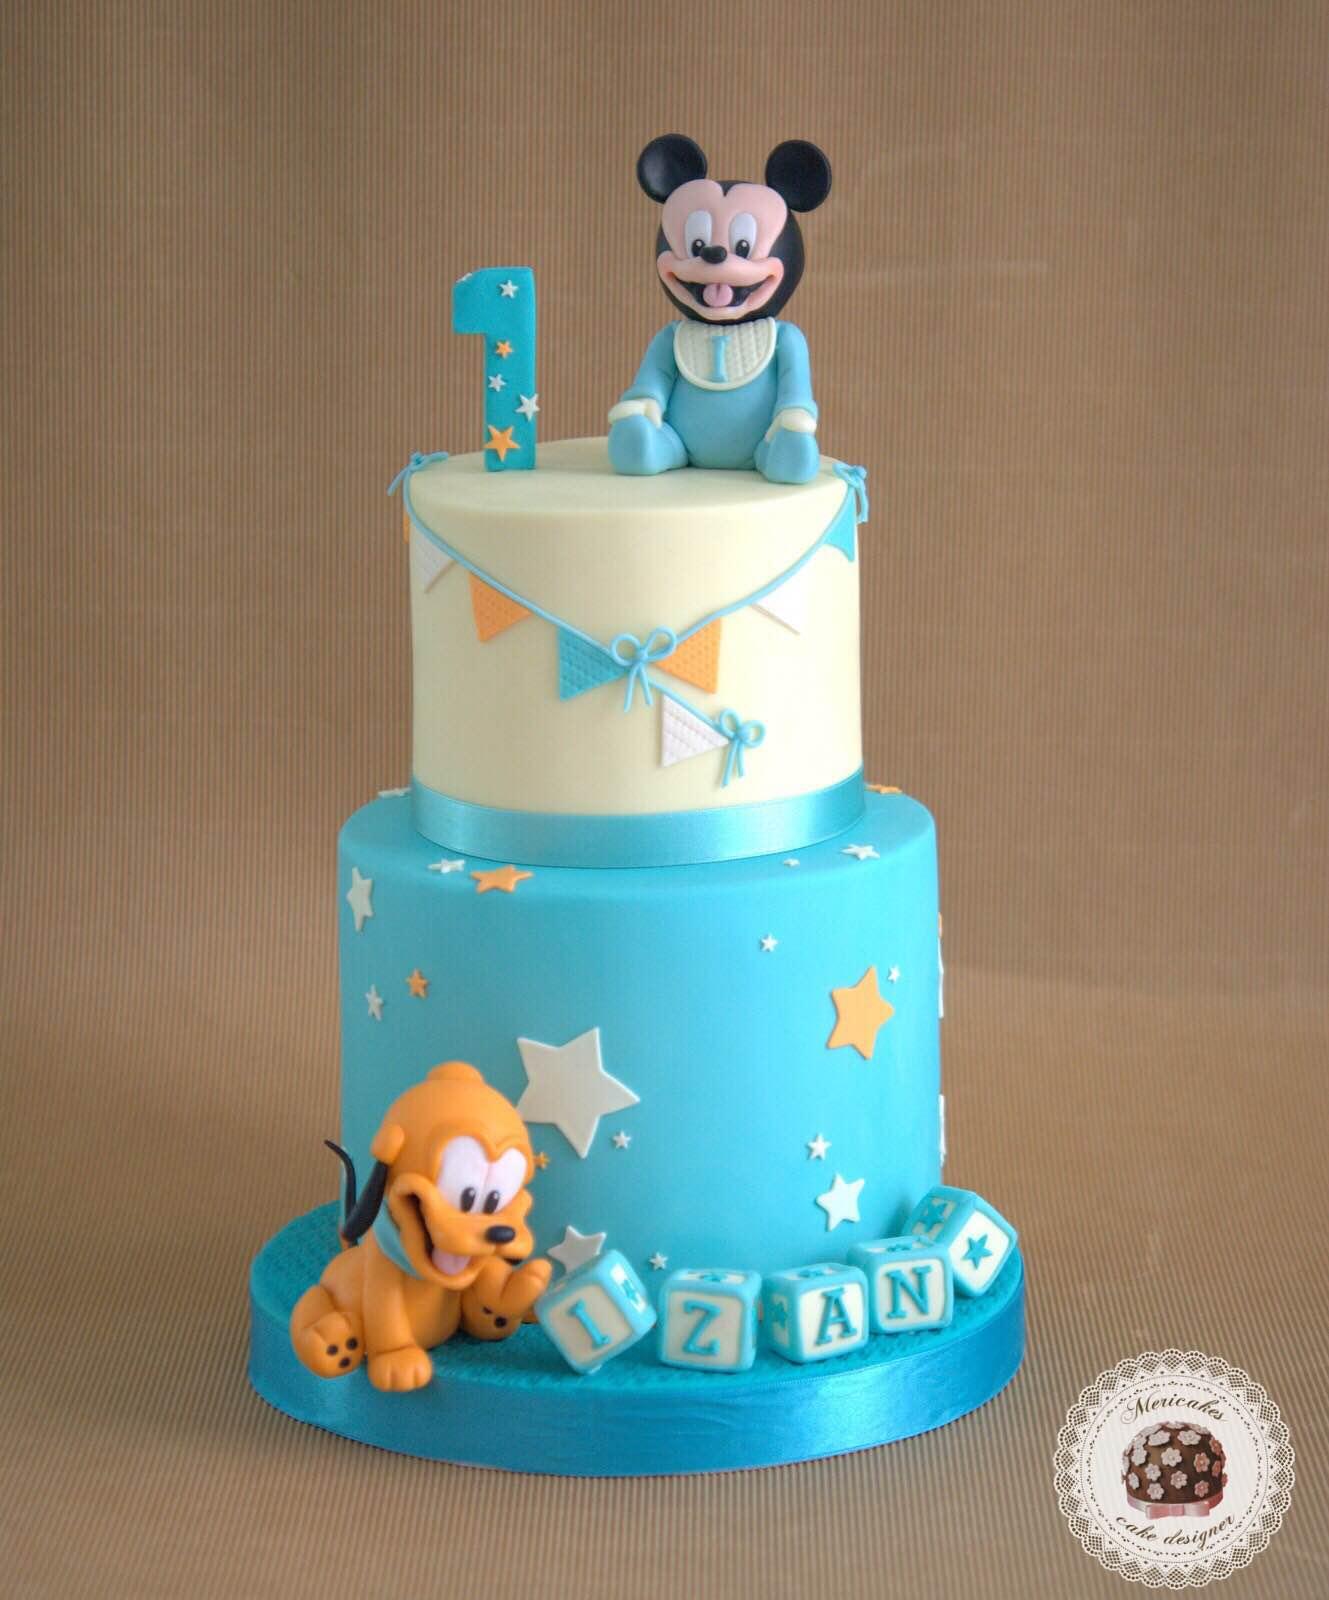 mickey-mousse-pluton-baby-bebes-baby-cake-tarta-tartas-decoradas-boy-cake-mericakes-barcelona-fondant-disney